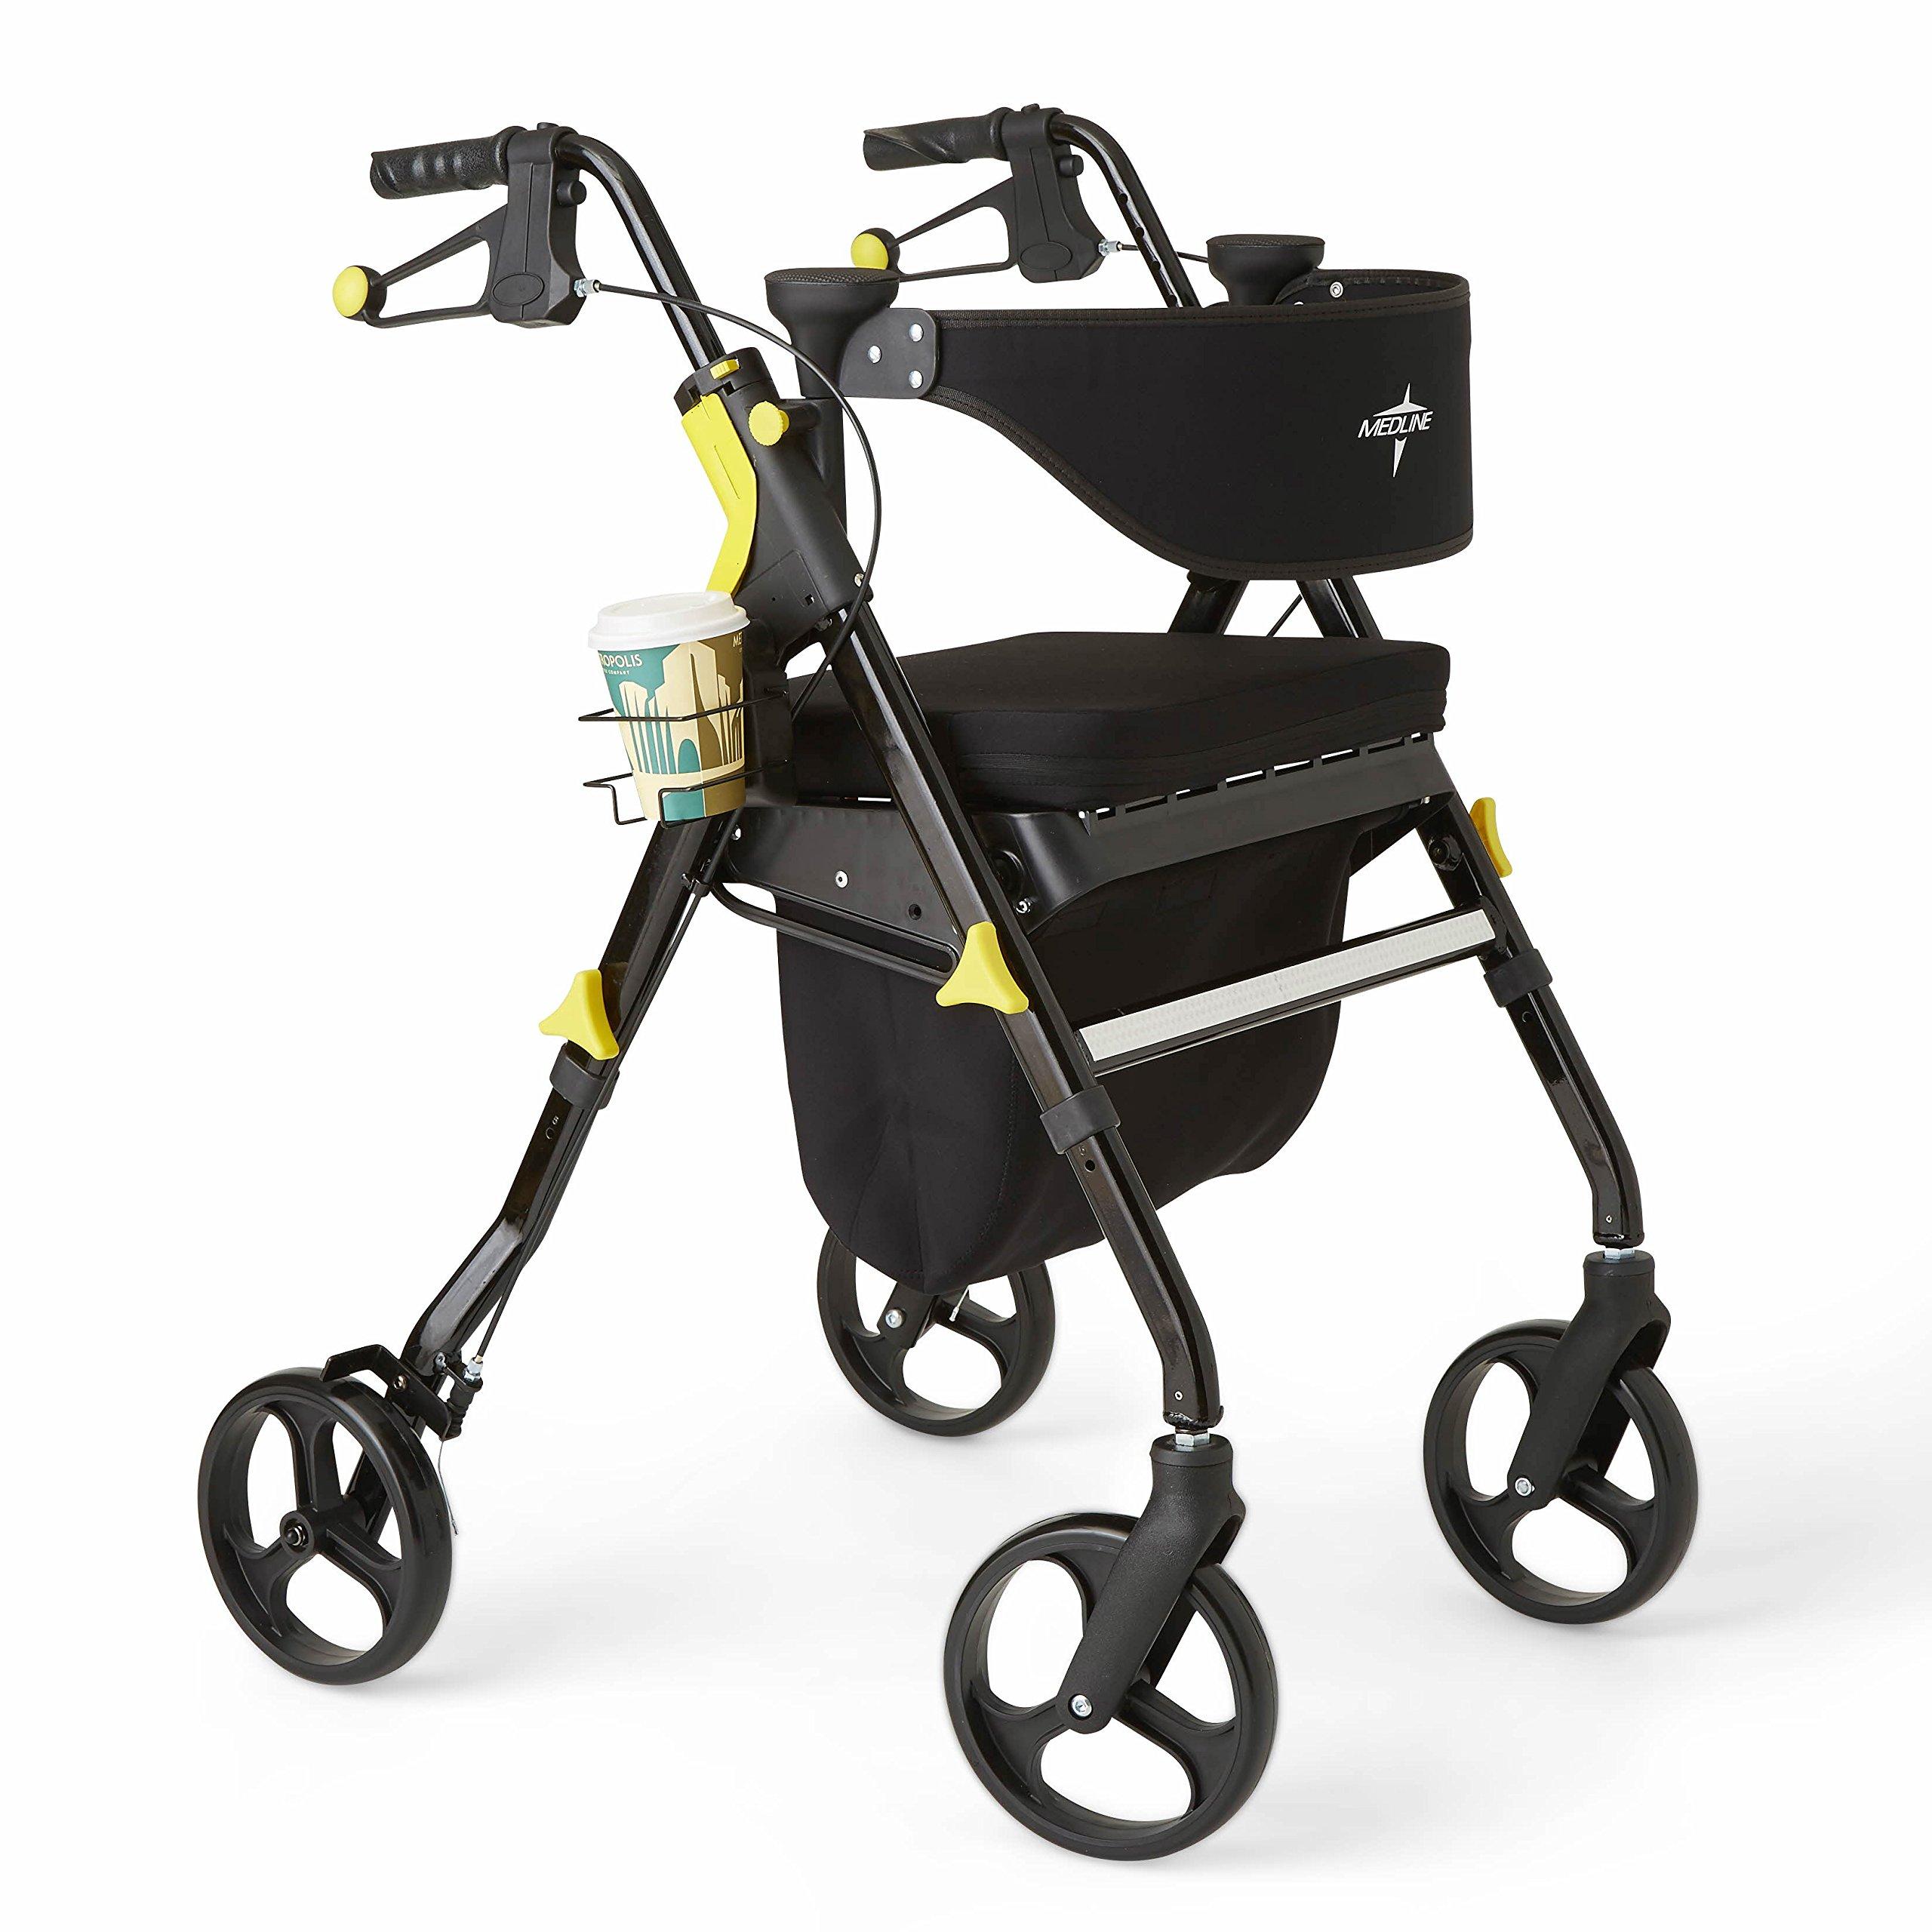 Medline Premium Empower Folding Rollator Walker with 8'' Wheels, Black